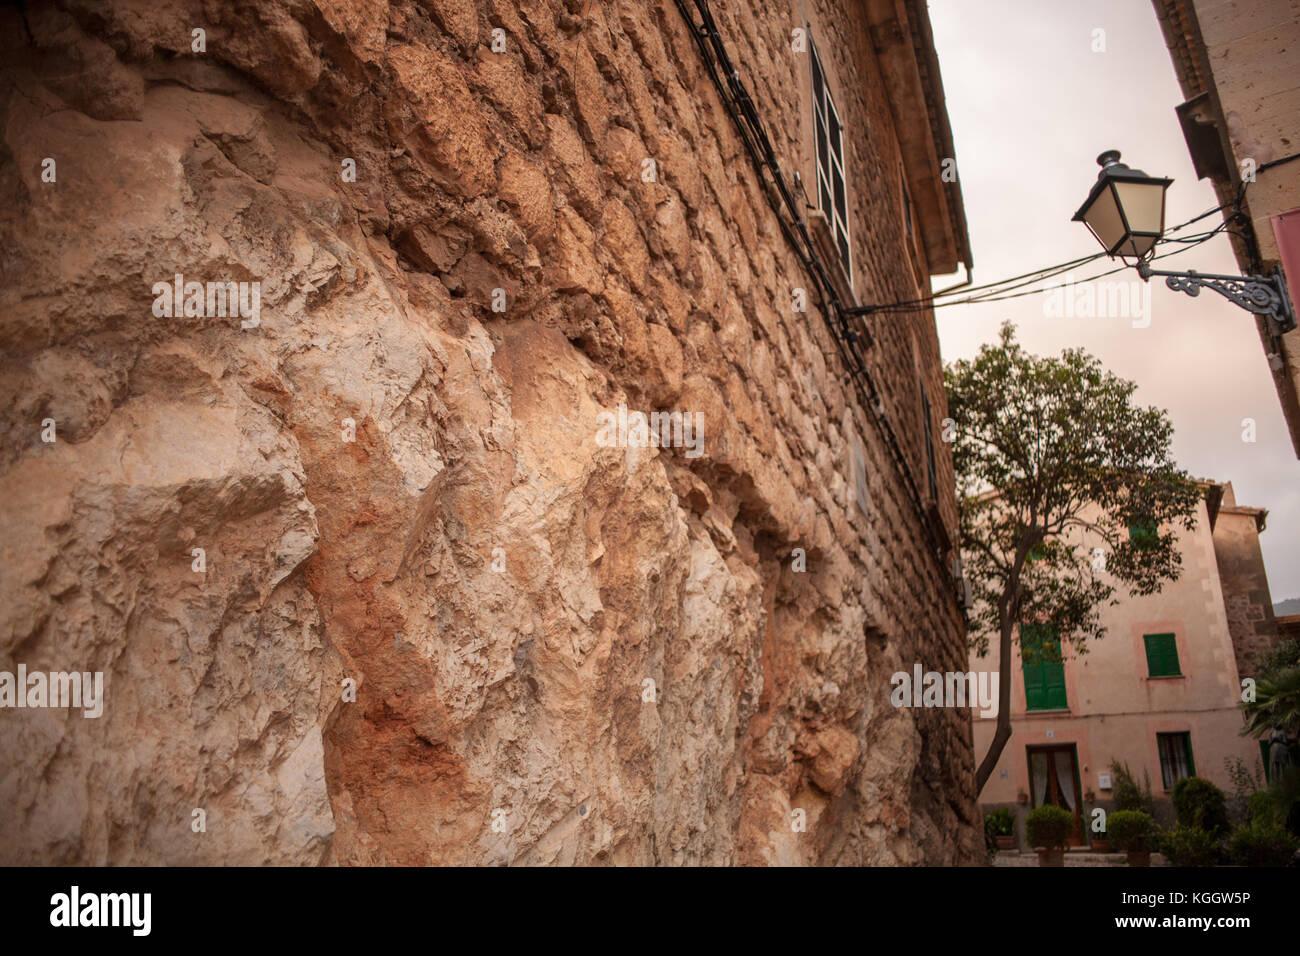 Pierre en ruine sur l'ancien home à Valldemossa, Majorque Photo Stock